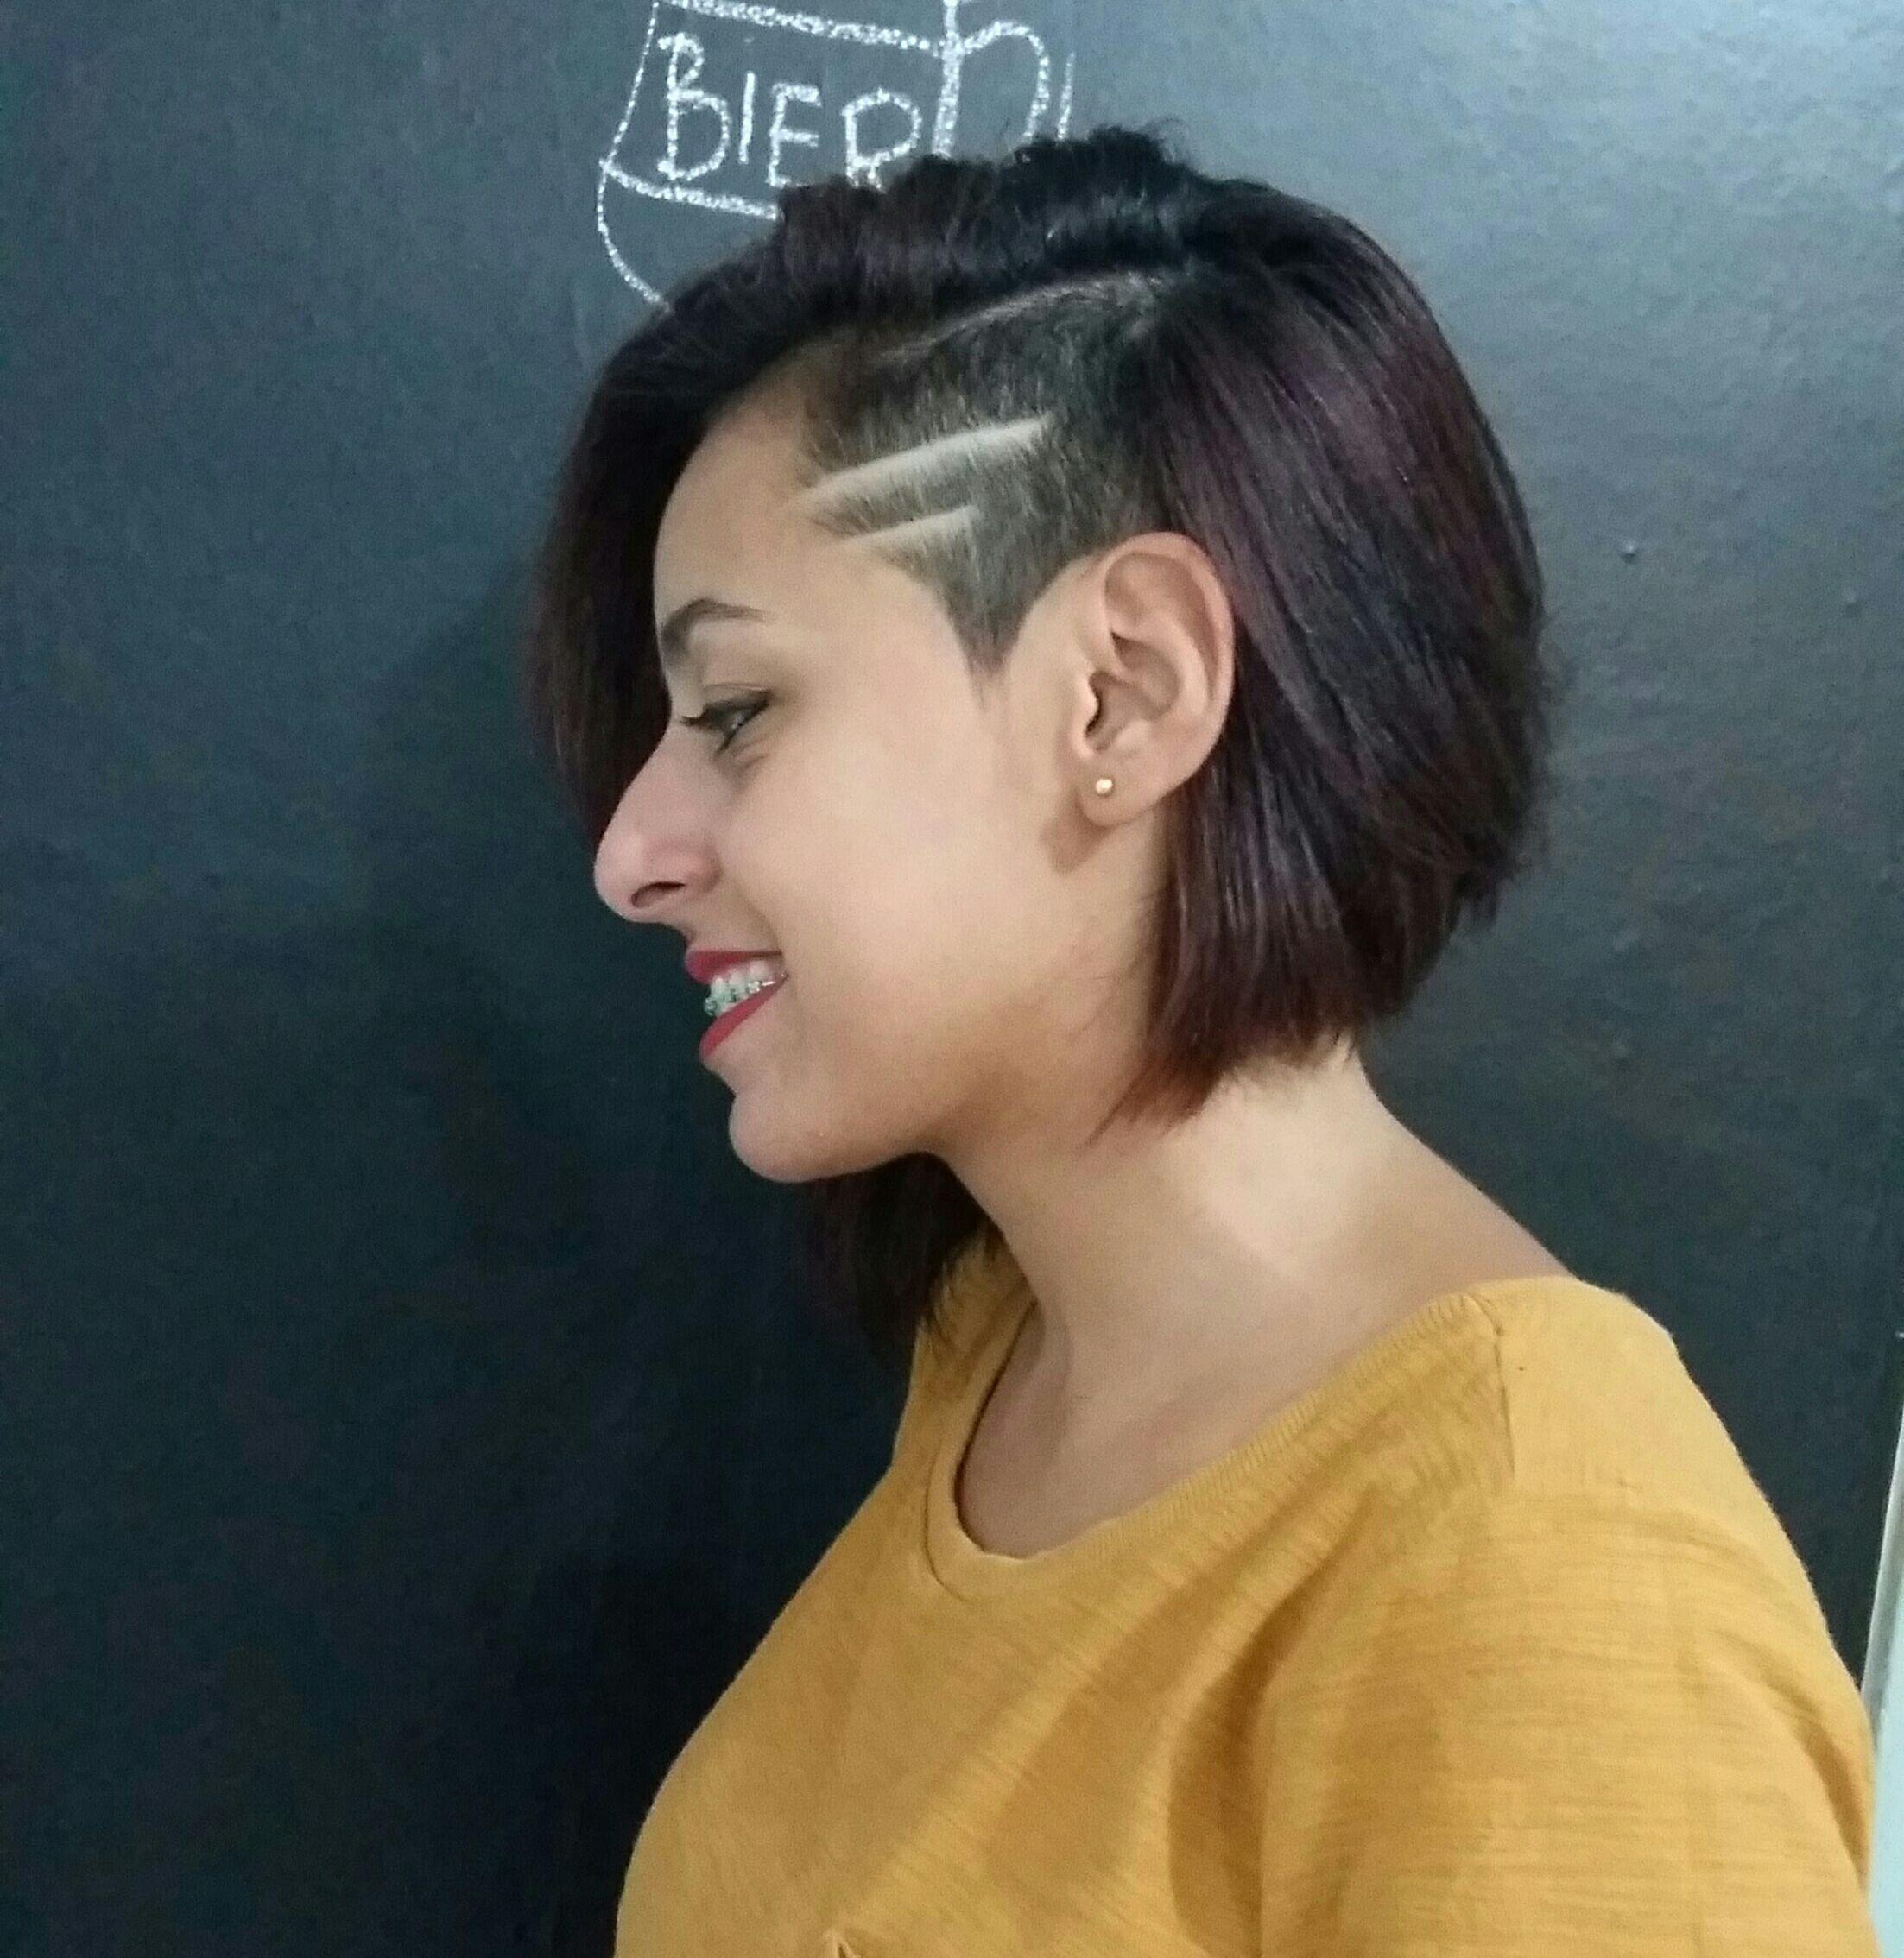 Haircut Feminino 💇😍 #cortefeminino #diferente #haircut #razorpart #barberwoman #barberlovers #barberbrasil #wahl #magicclip #detailer #supertaper cabelo barbeiro(a) cabeleireiro(a)